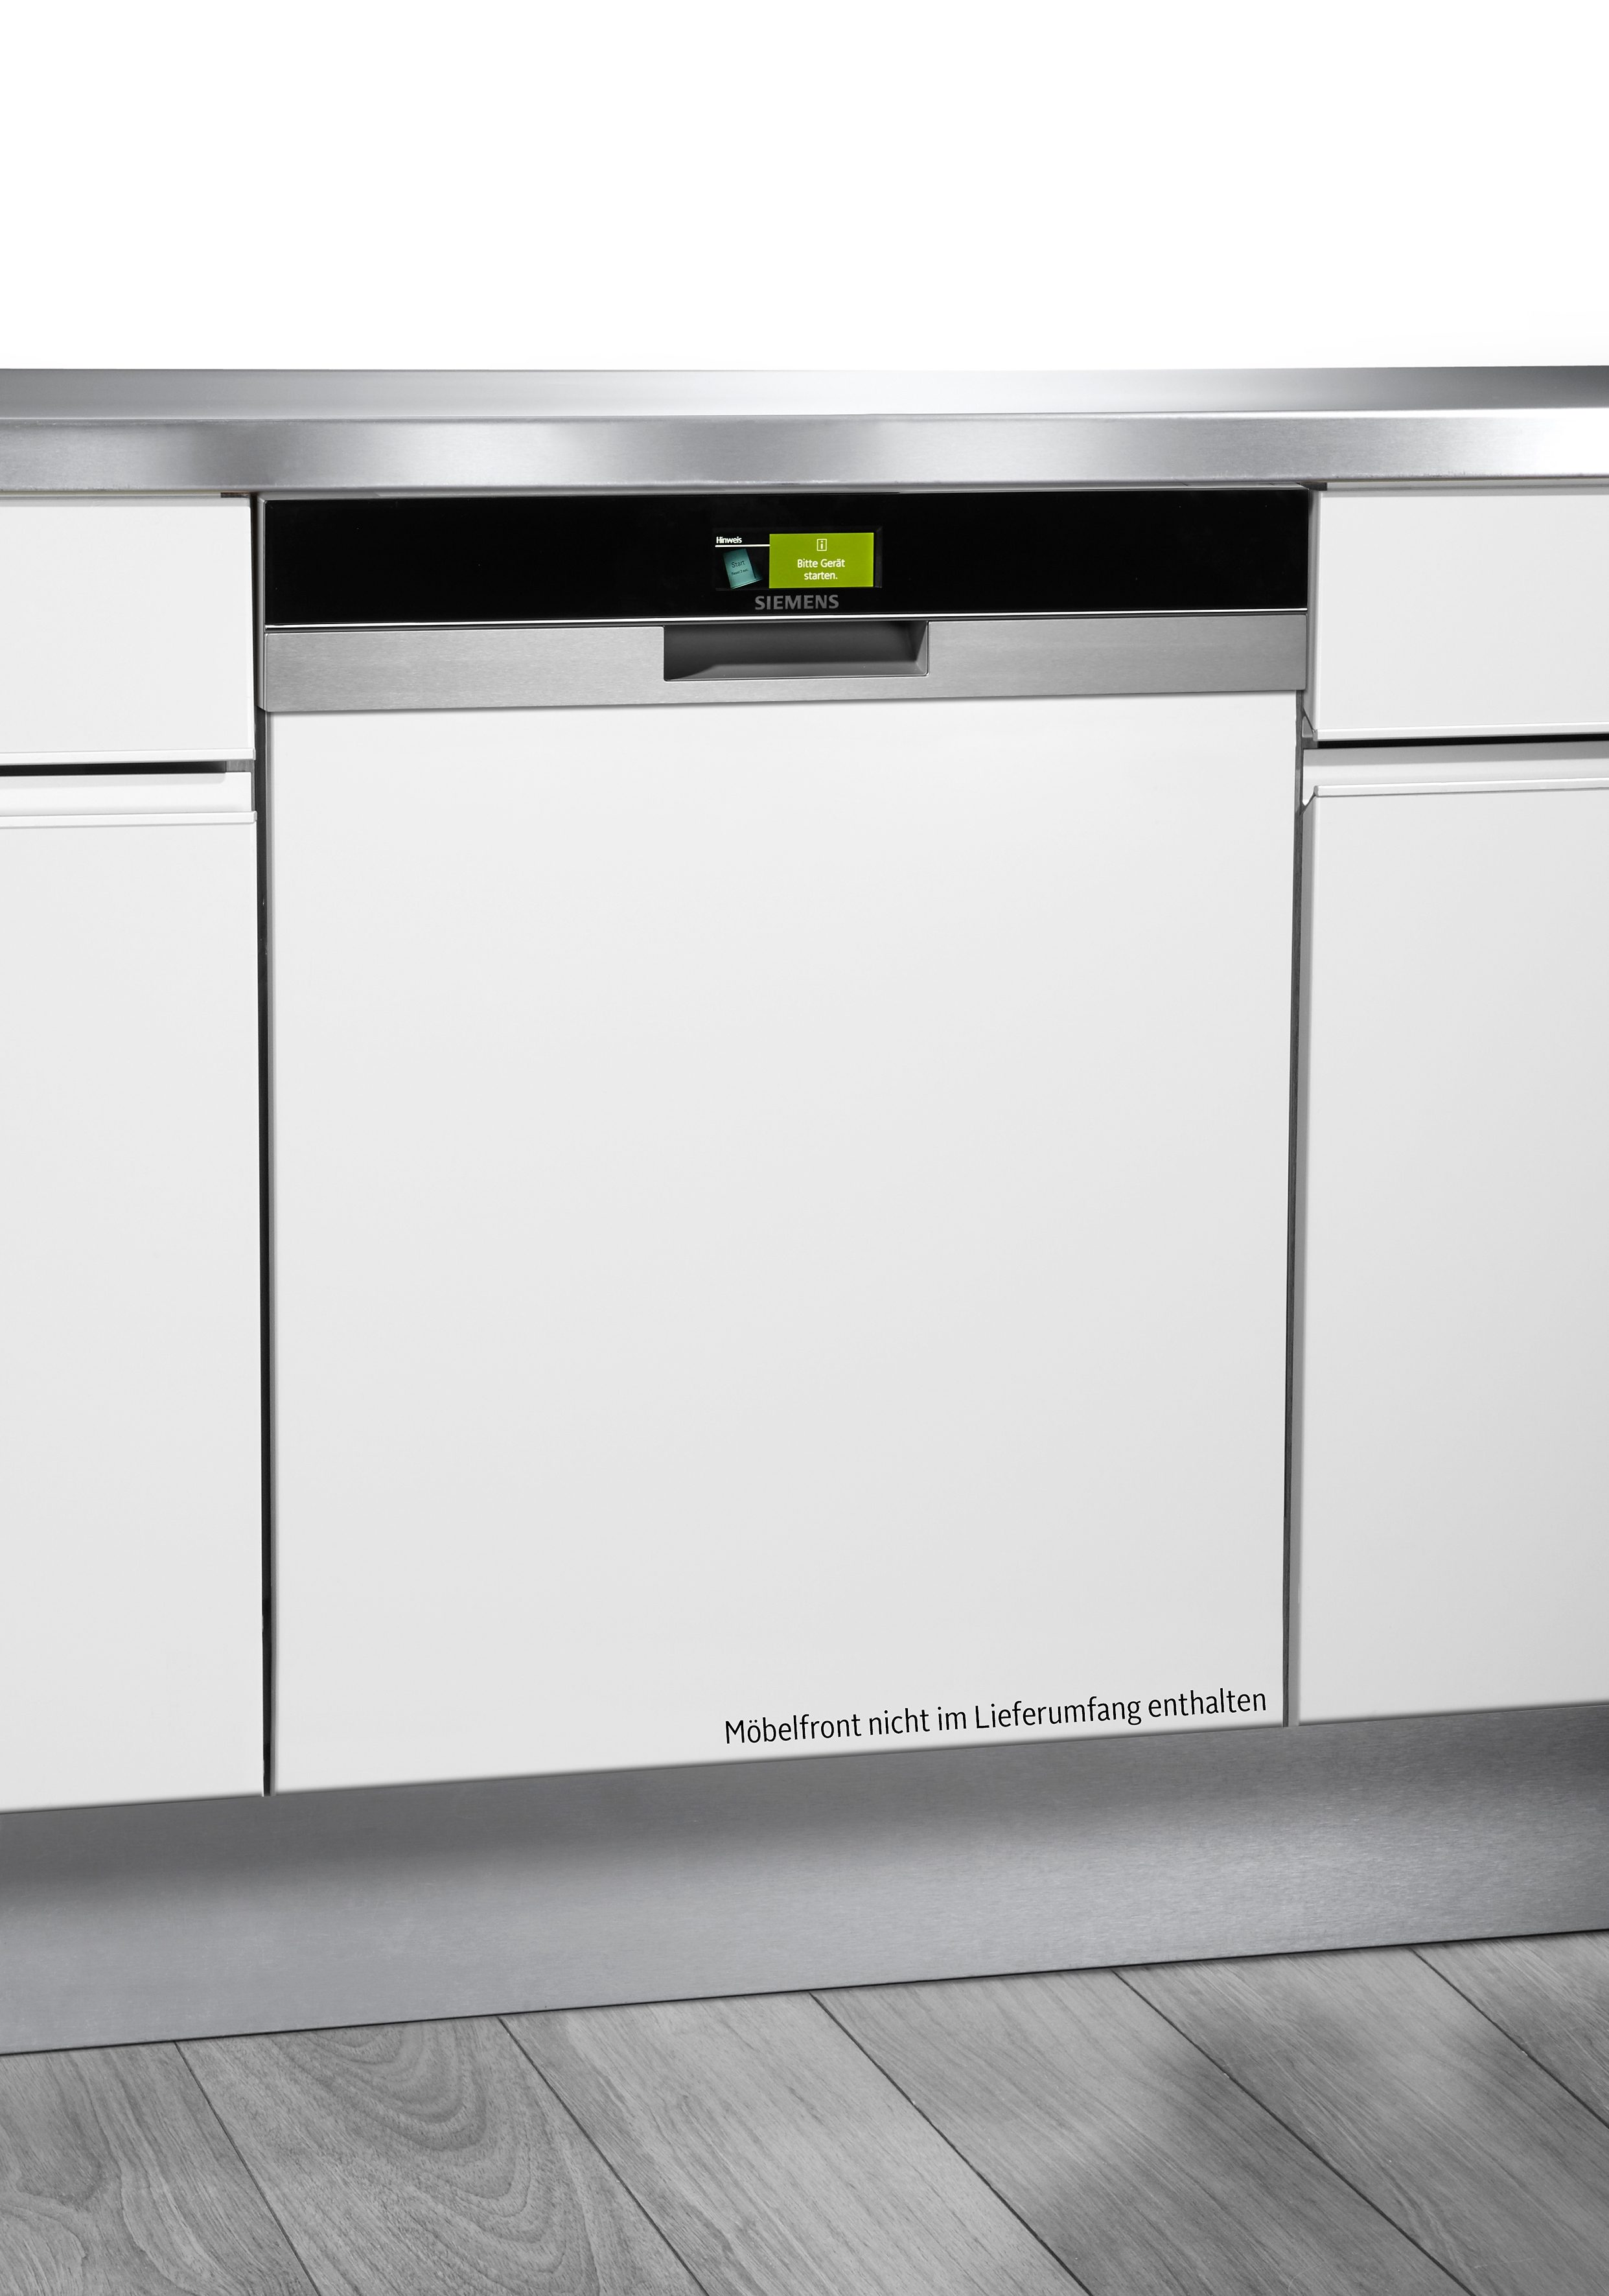 Siemens Spüler 60cm integriert Edelstahl SN578S03TE, A+++ , 7,5 Liter, 13 Maßgedecke